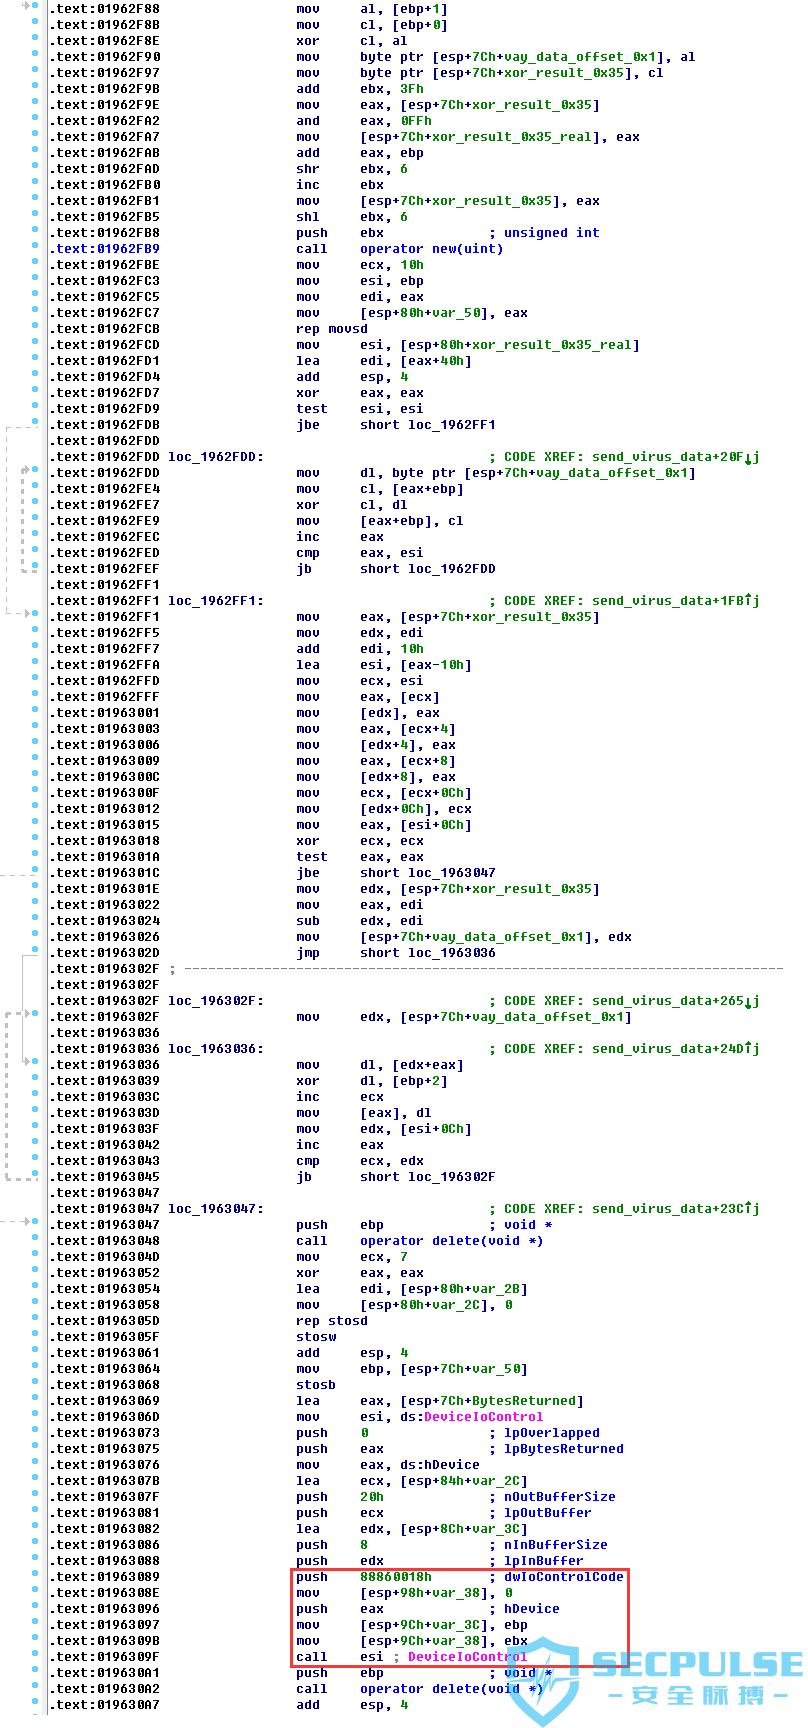 16 upd.dat代码将vayout.fxb数据解密后发送给BulkEncX驱动